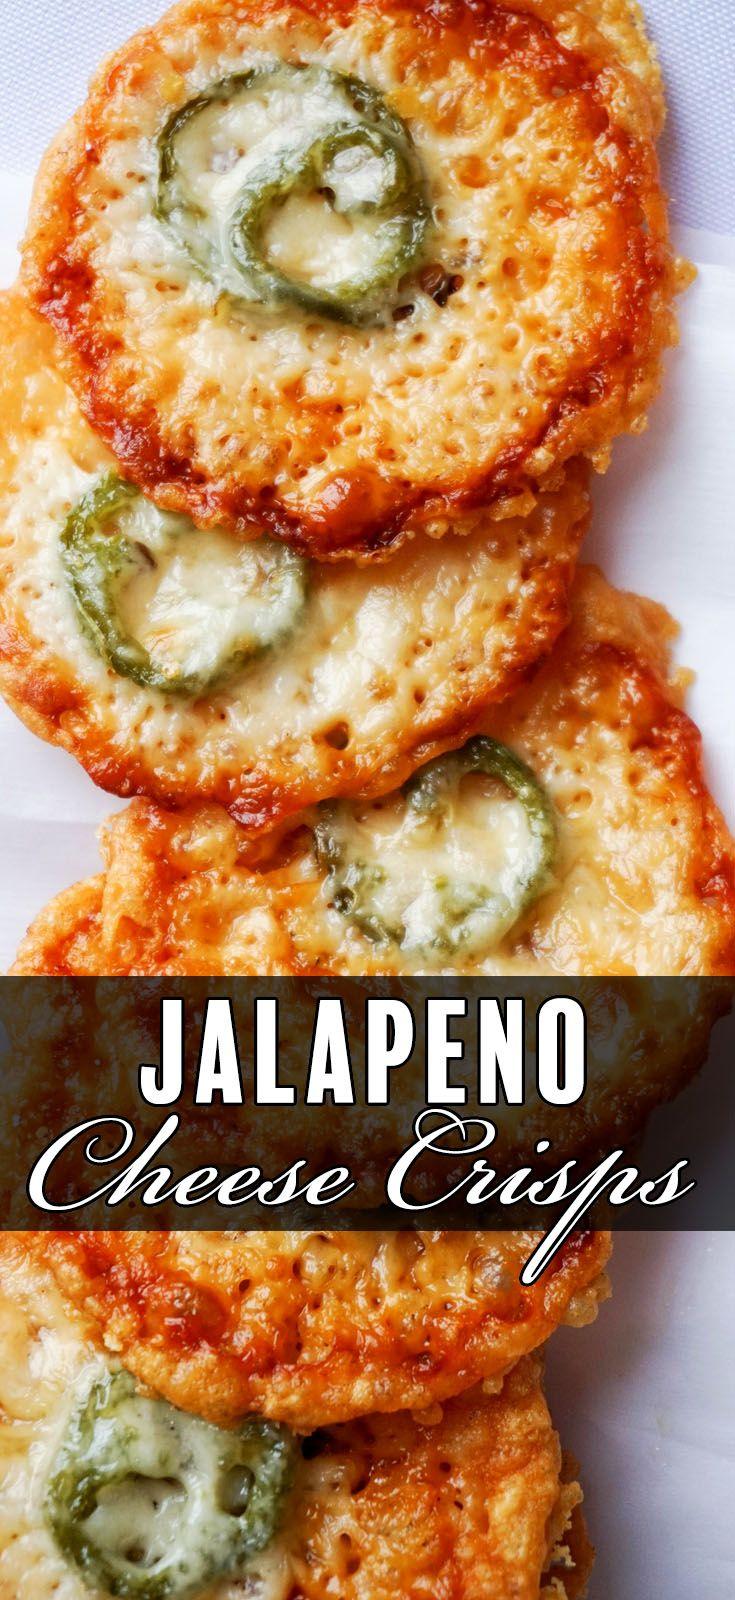 Parmesan Crisps - KetoConnect | Keto | Pinterest | Parmesan, Snacks and Keto